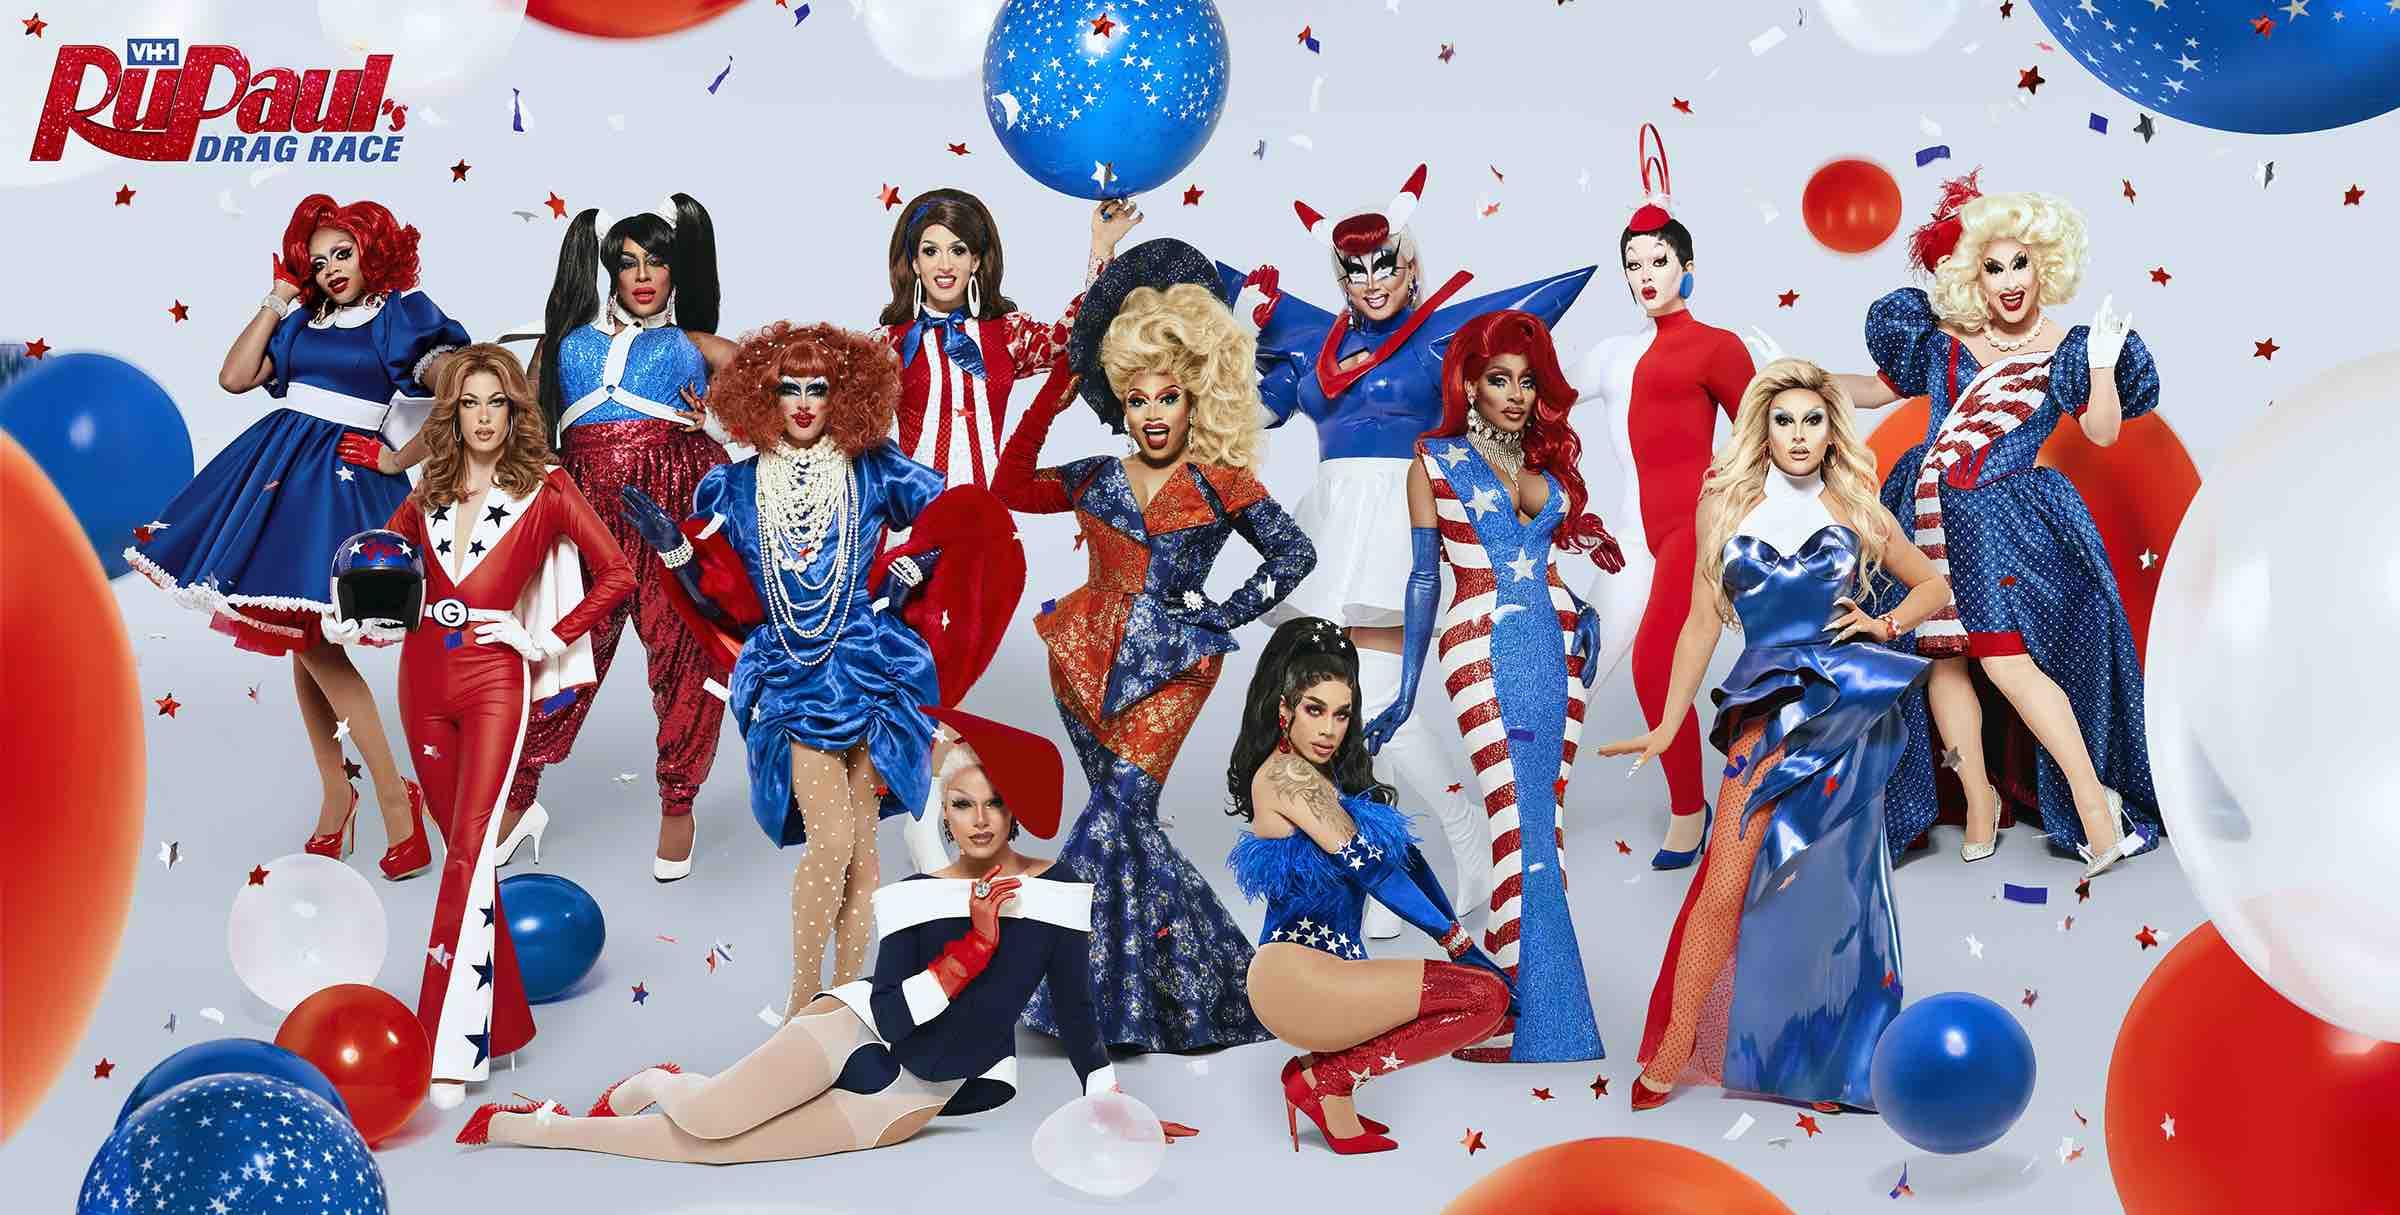 We've met nearly everyone, except Rock M. Sakura, Sherry Pie, and Widow VonDu. Here's the final 'RuPaul's Drag Race' season 12 queen reveal.